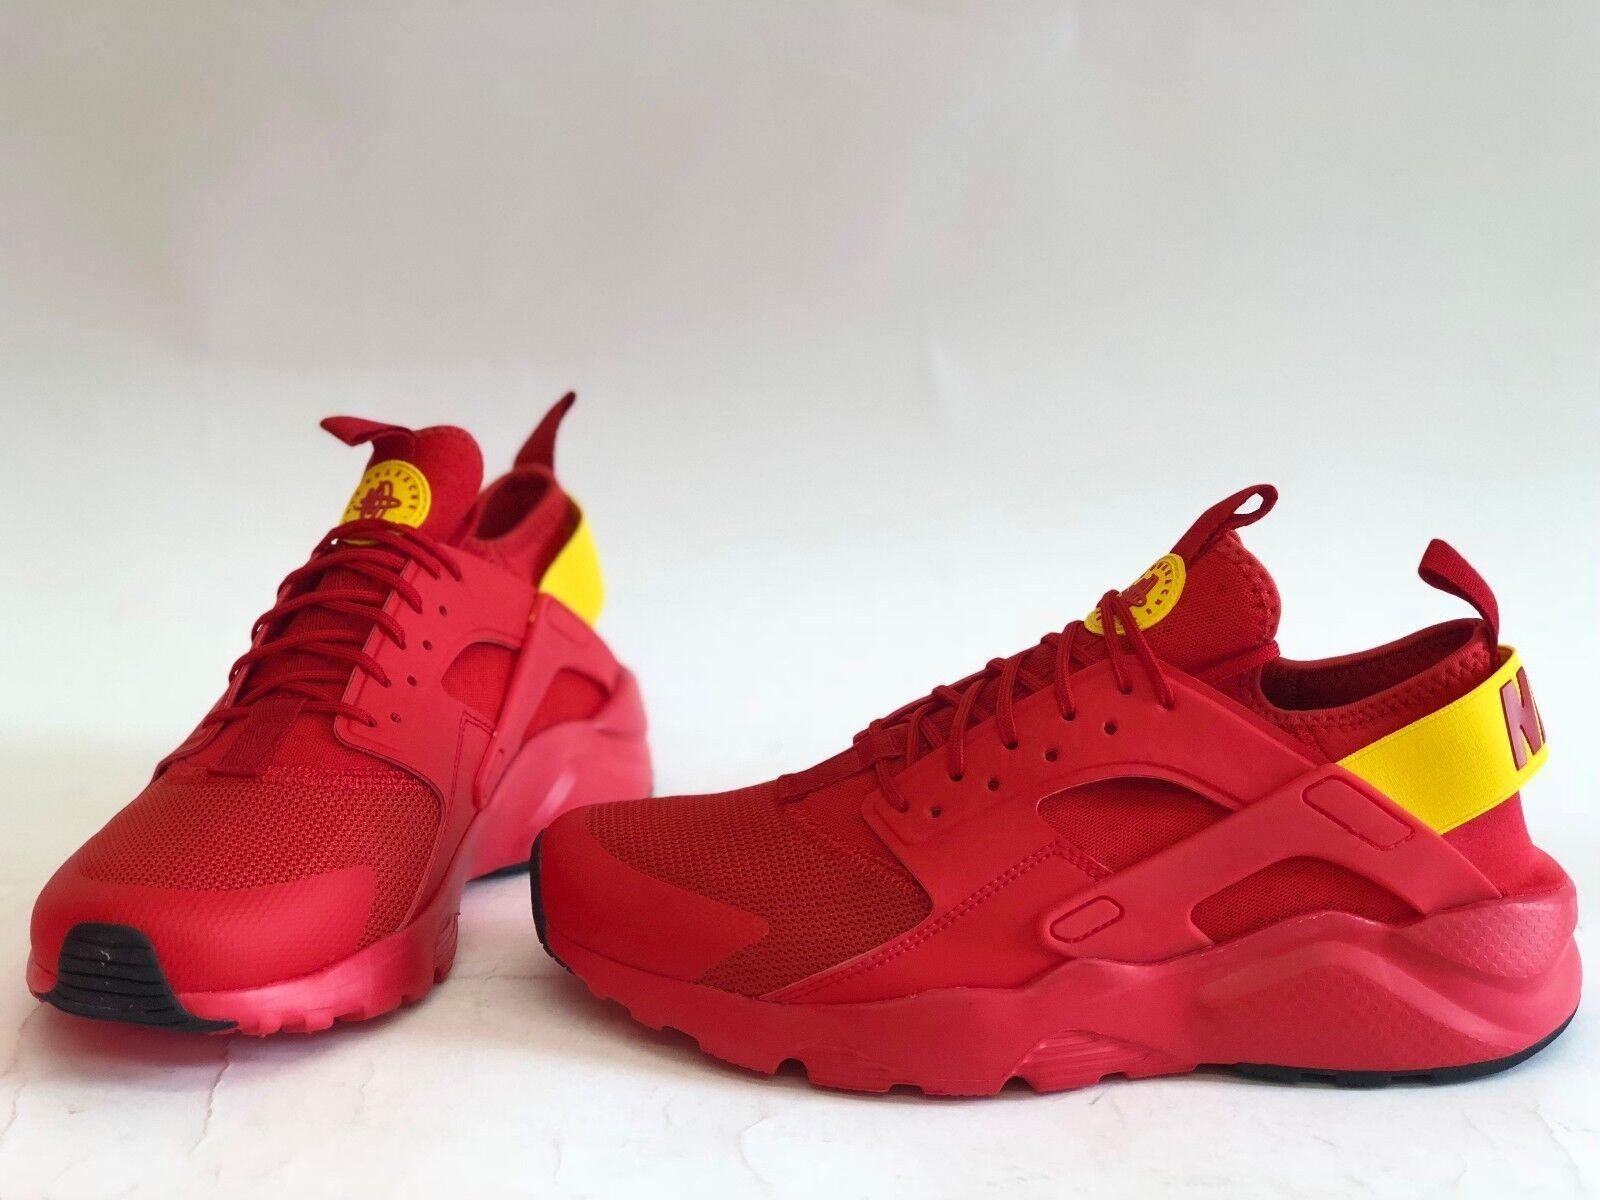 Pennino Uomo misura 8,5 nike air rosso huarache correndo ultra scarpe rosso air 819685-607 52a075